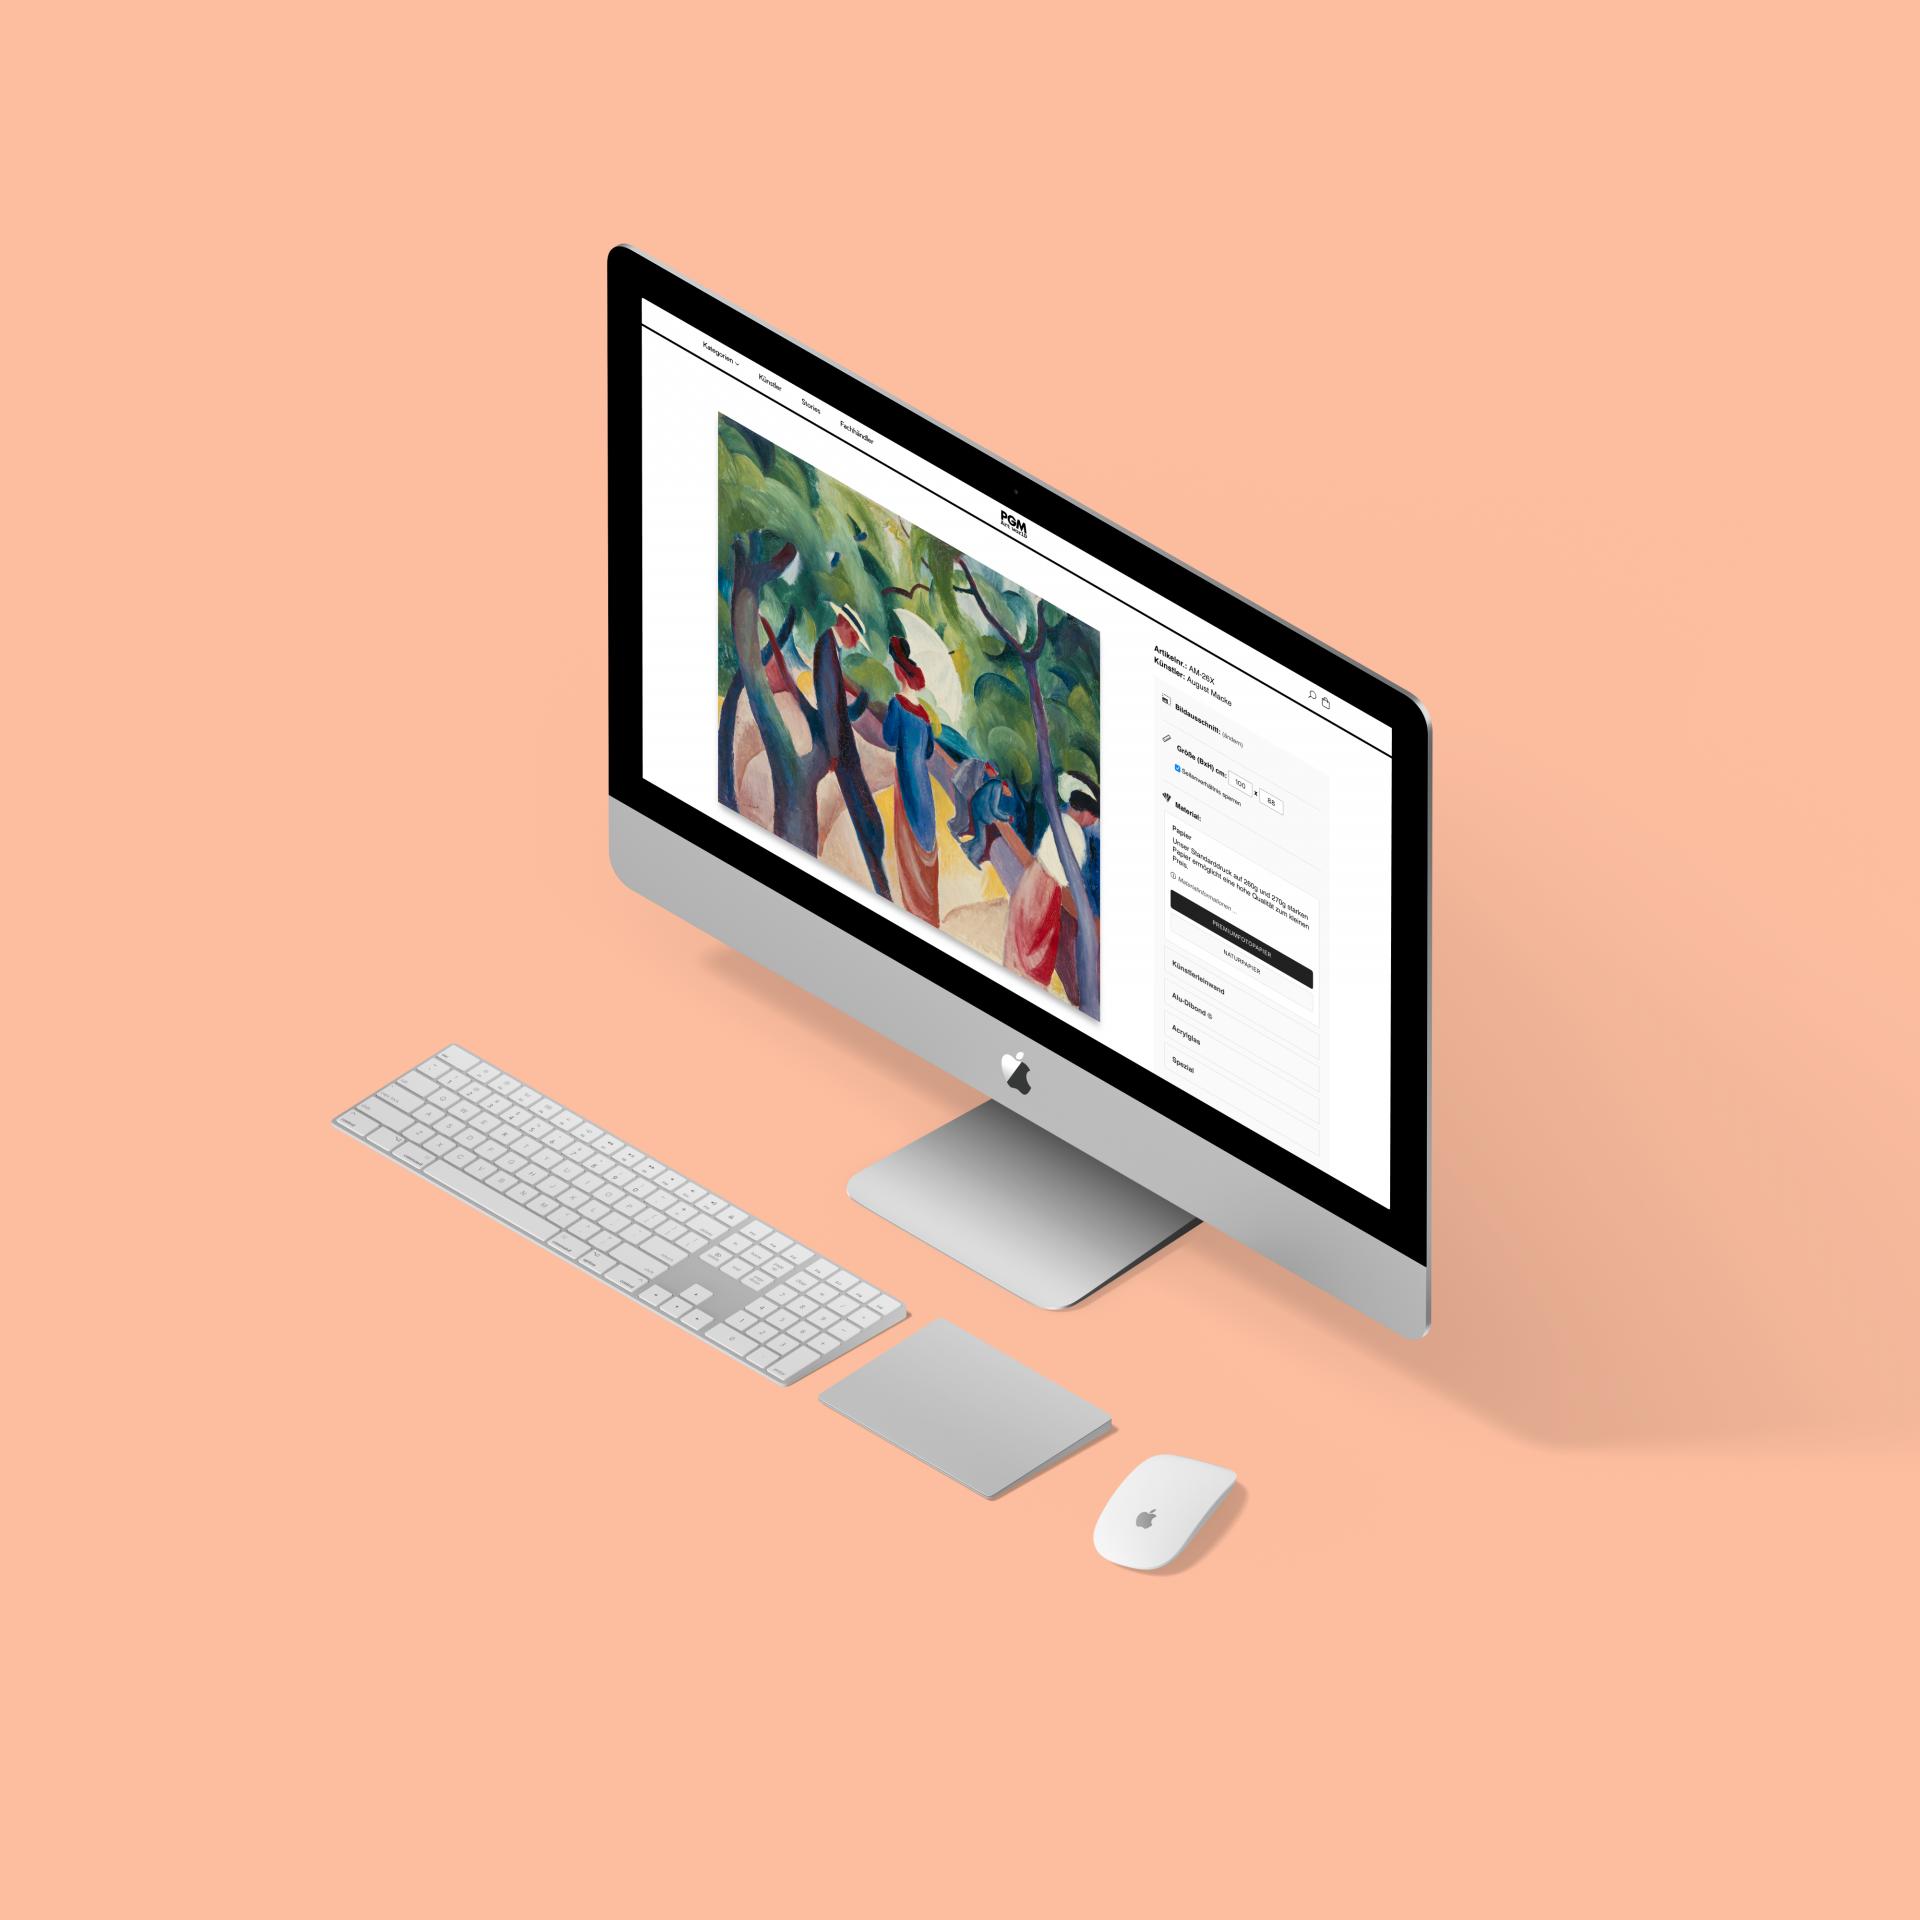 pgm artworld shopify art shop case study desktop mockup